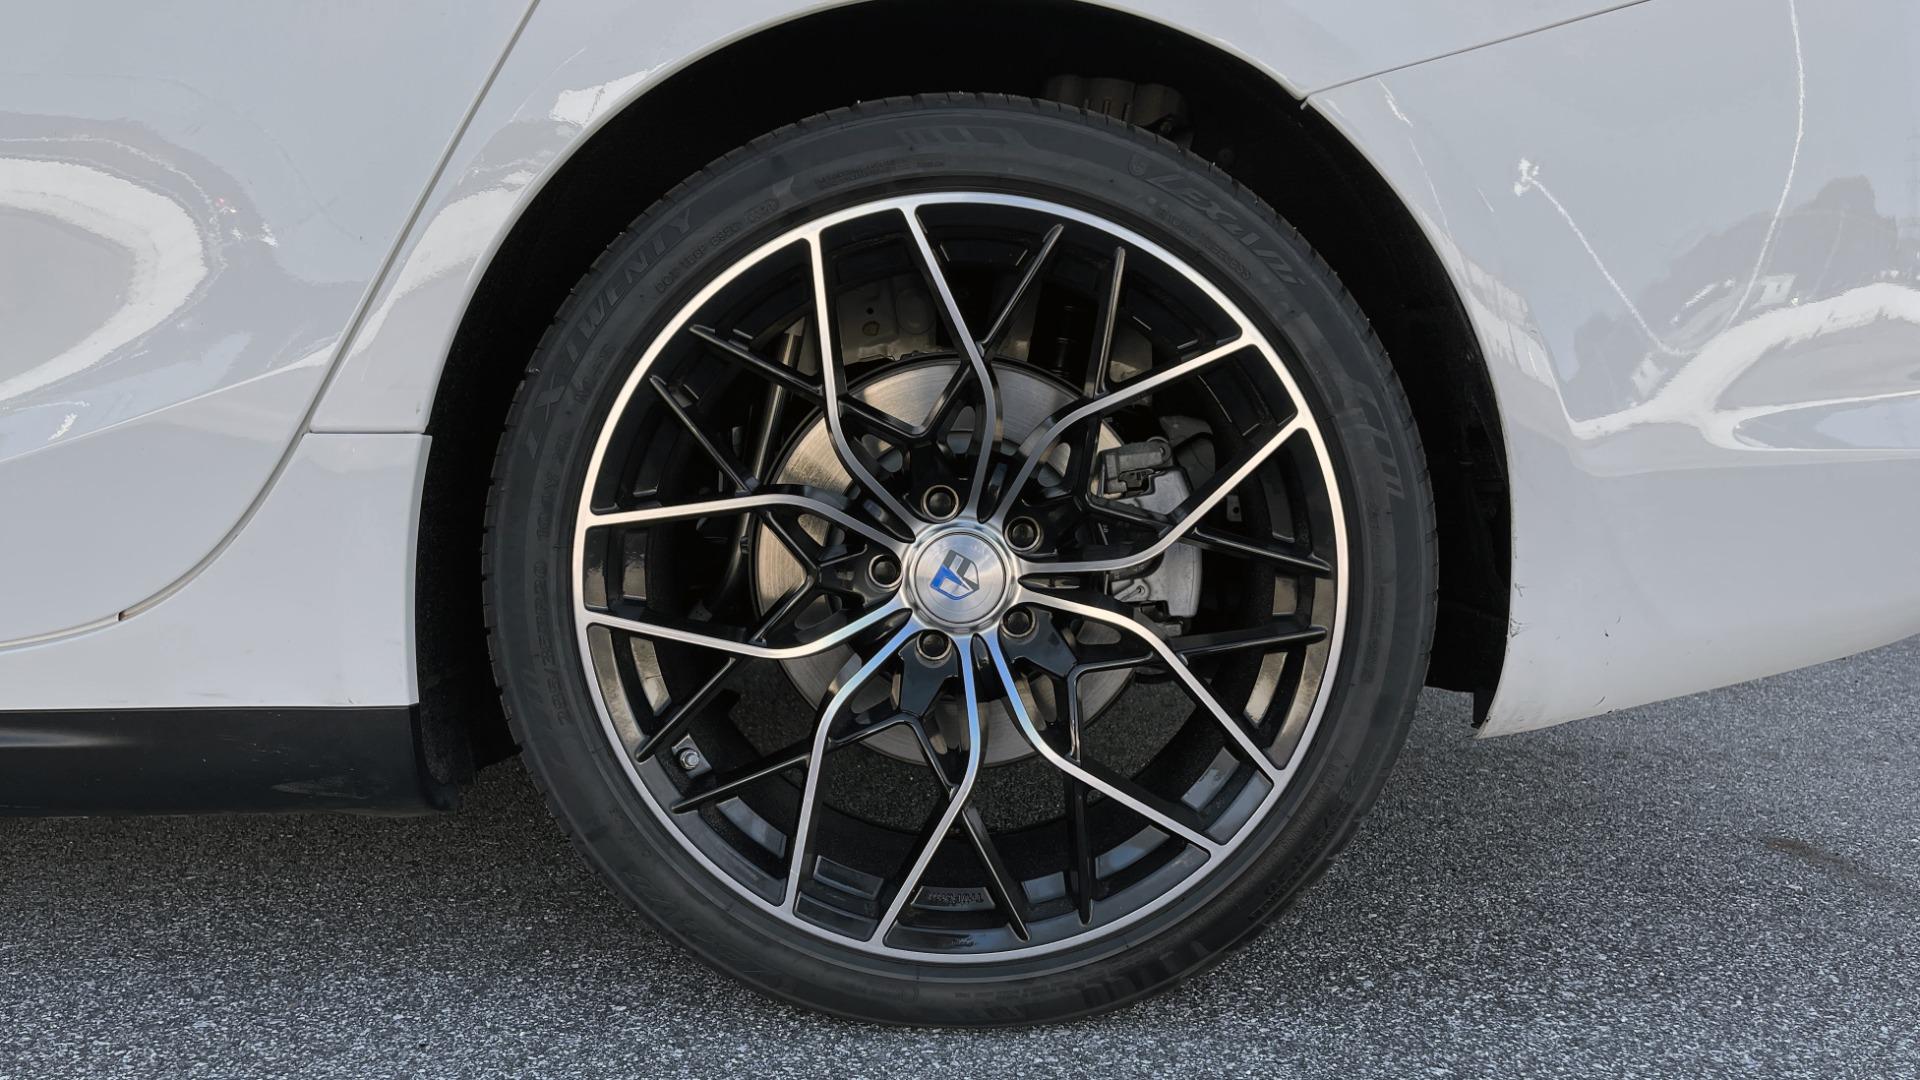 Used 2018 Maserati GHIBLI SEDAN / RWD / 3.0L V6 / SUNROOF / NAV / REARVIEW for sale $42,995 at Formula Imports in Charlotte NC 28227 62